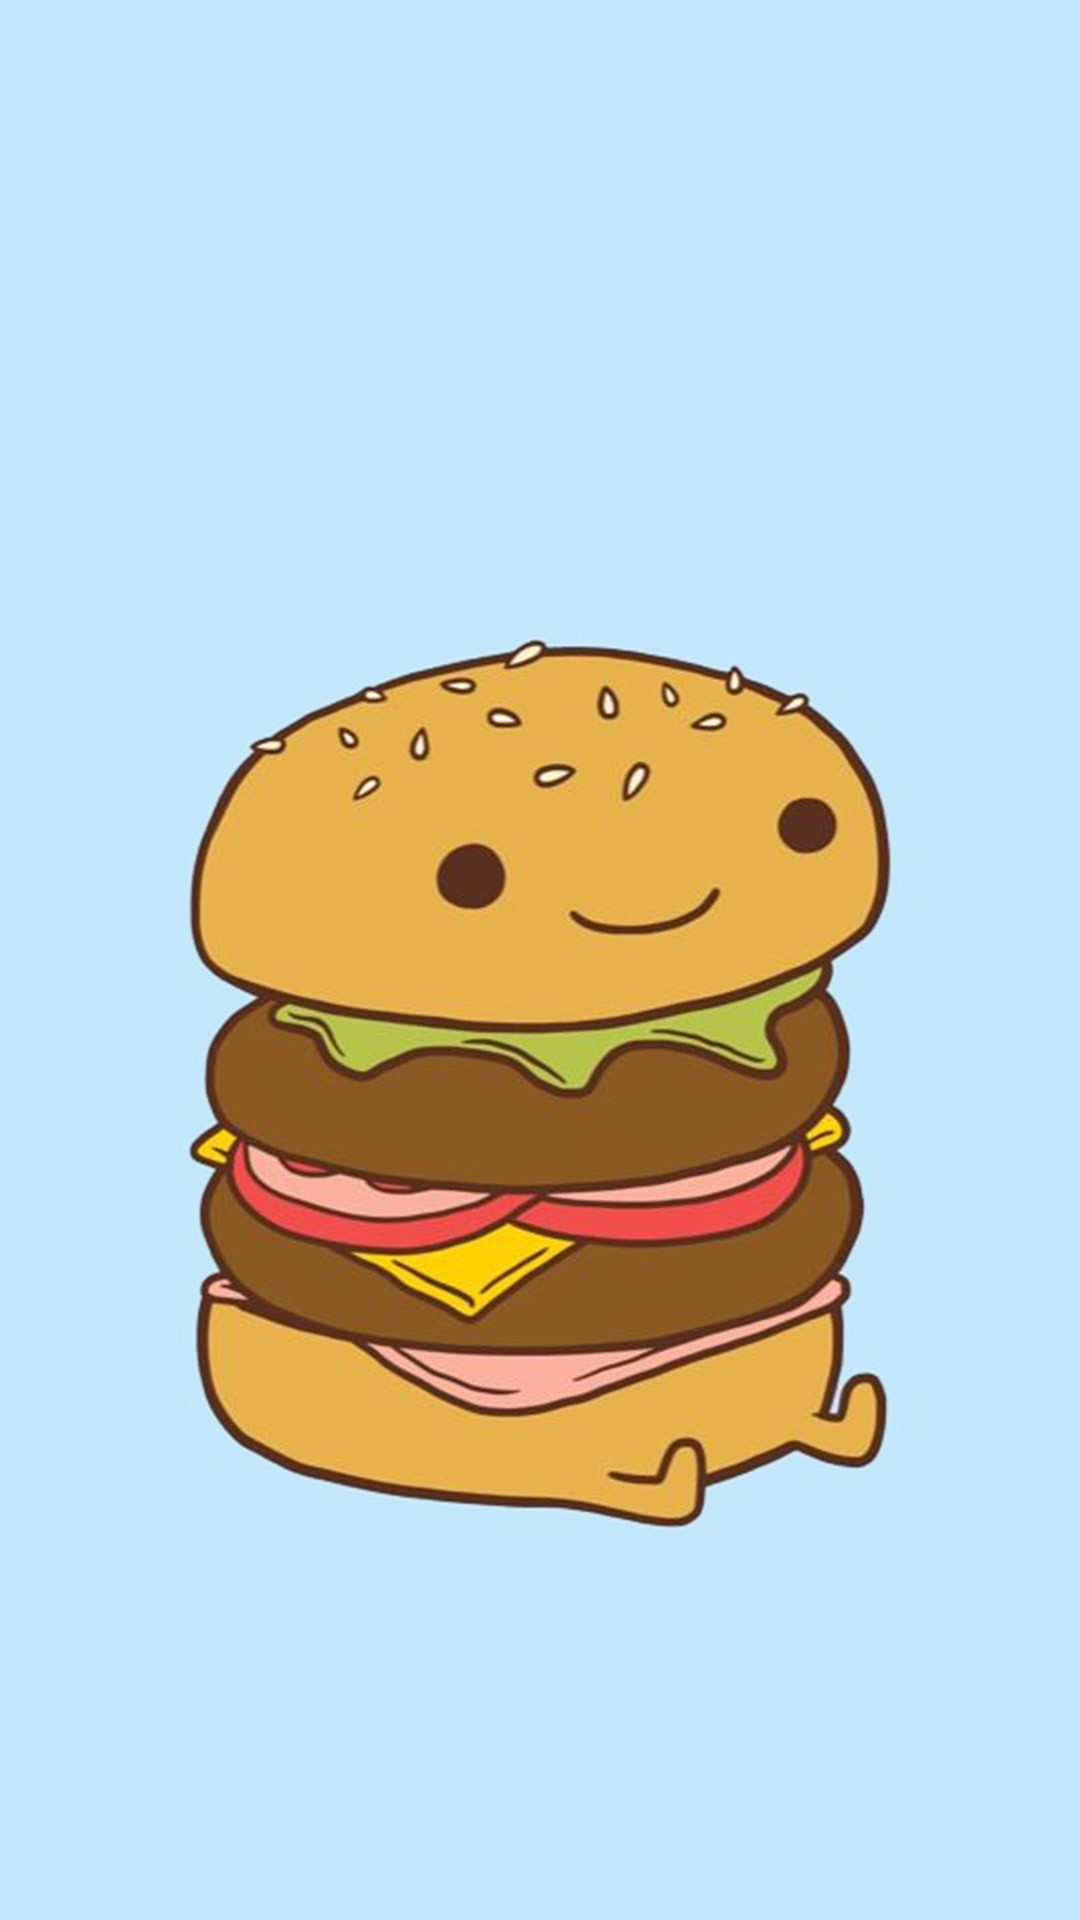 Burger Wallpaper 1 | Foods Wallpapers | Pinterest | Burger meat, Burgers  and Vegetable bread